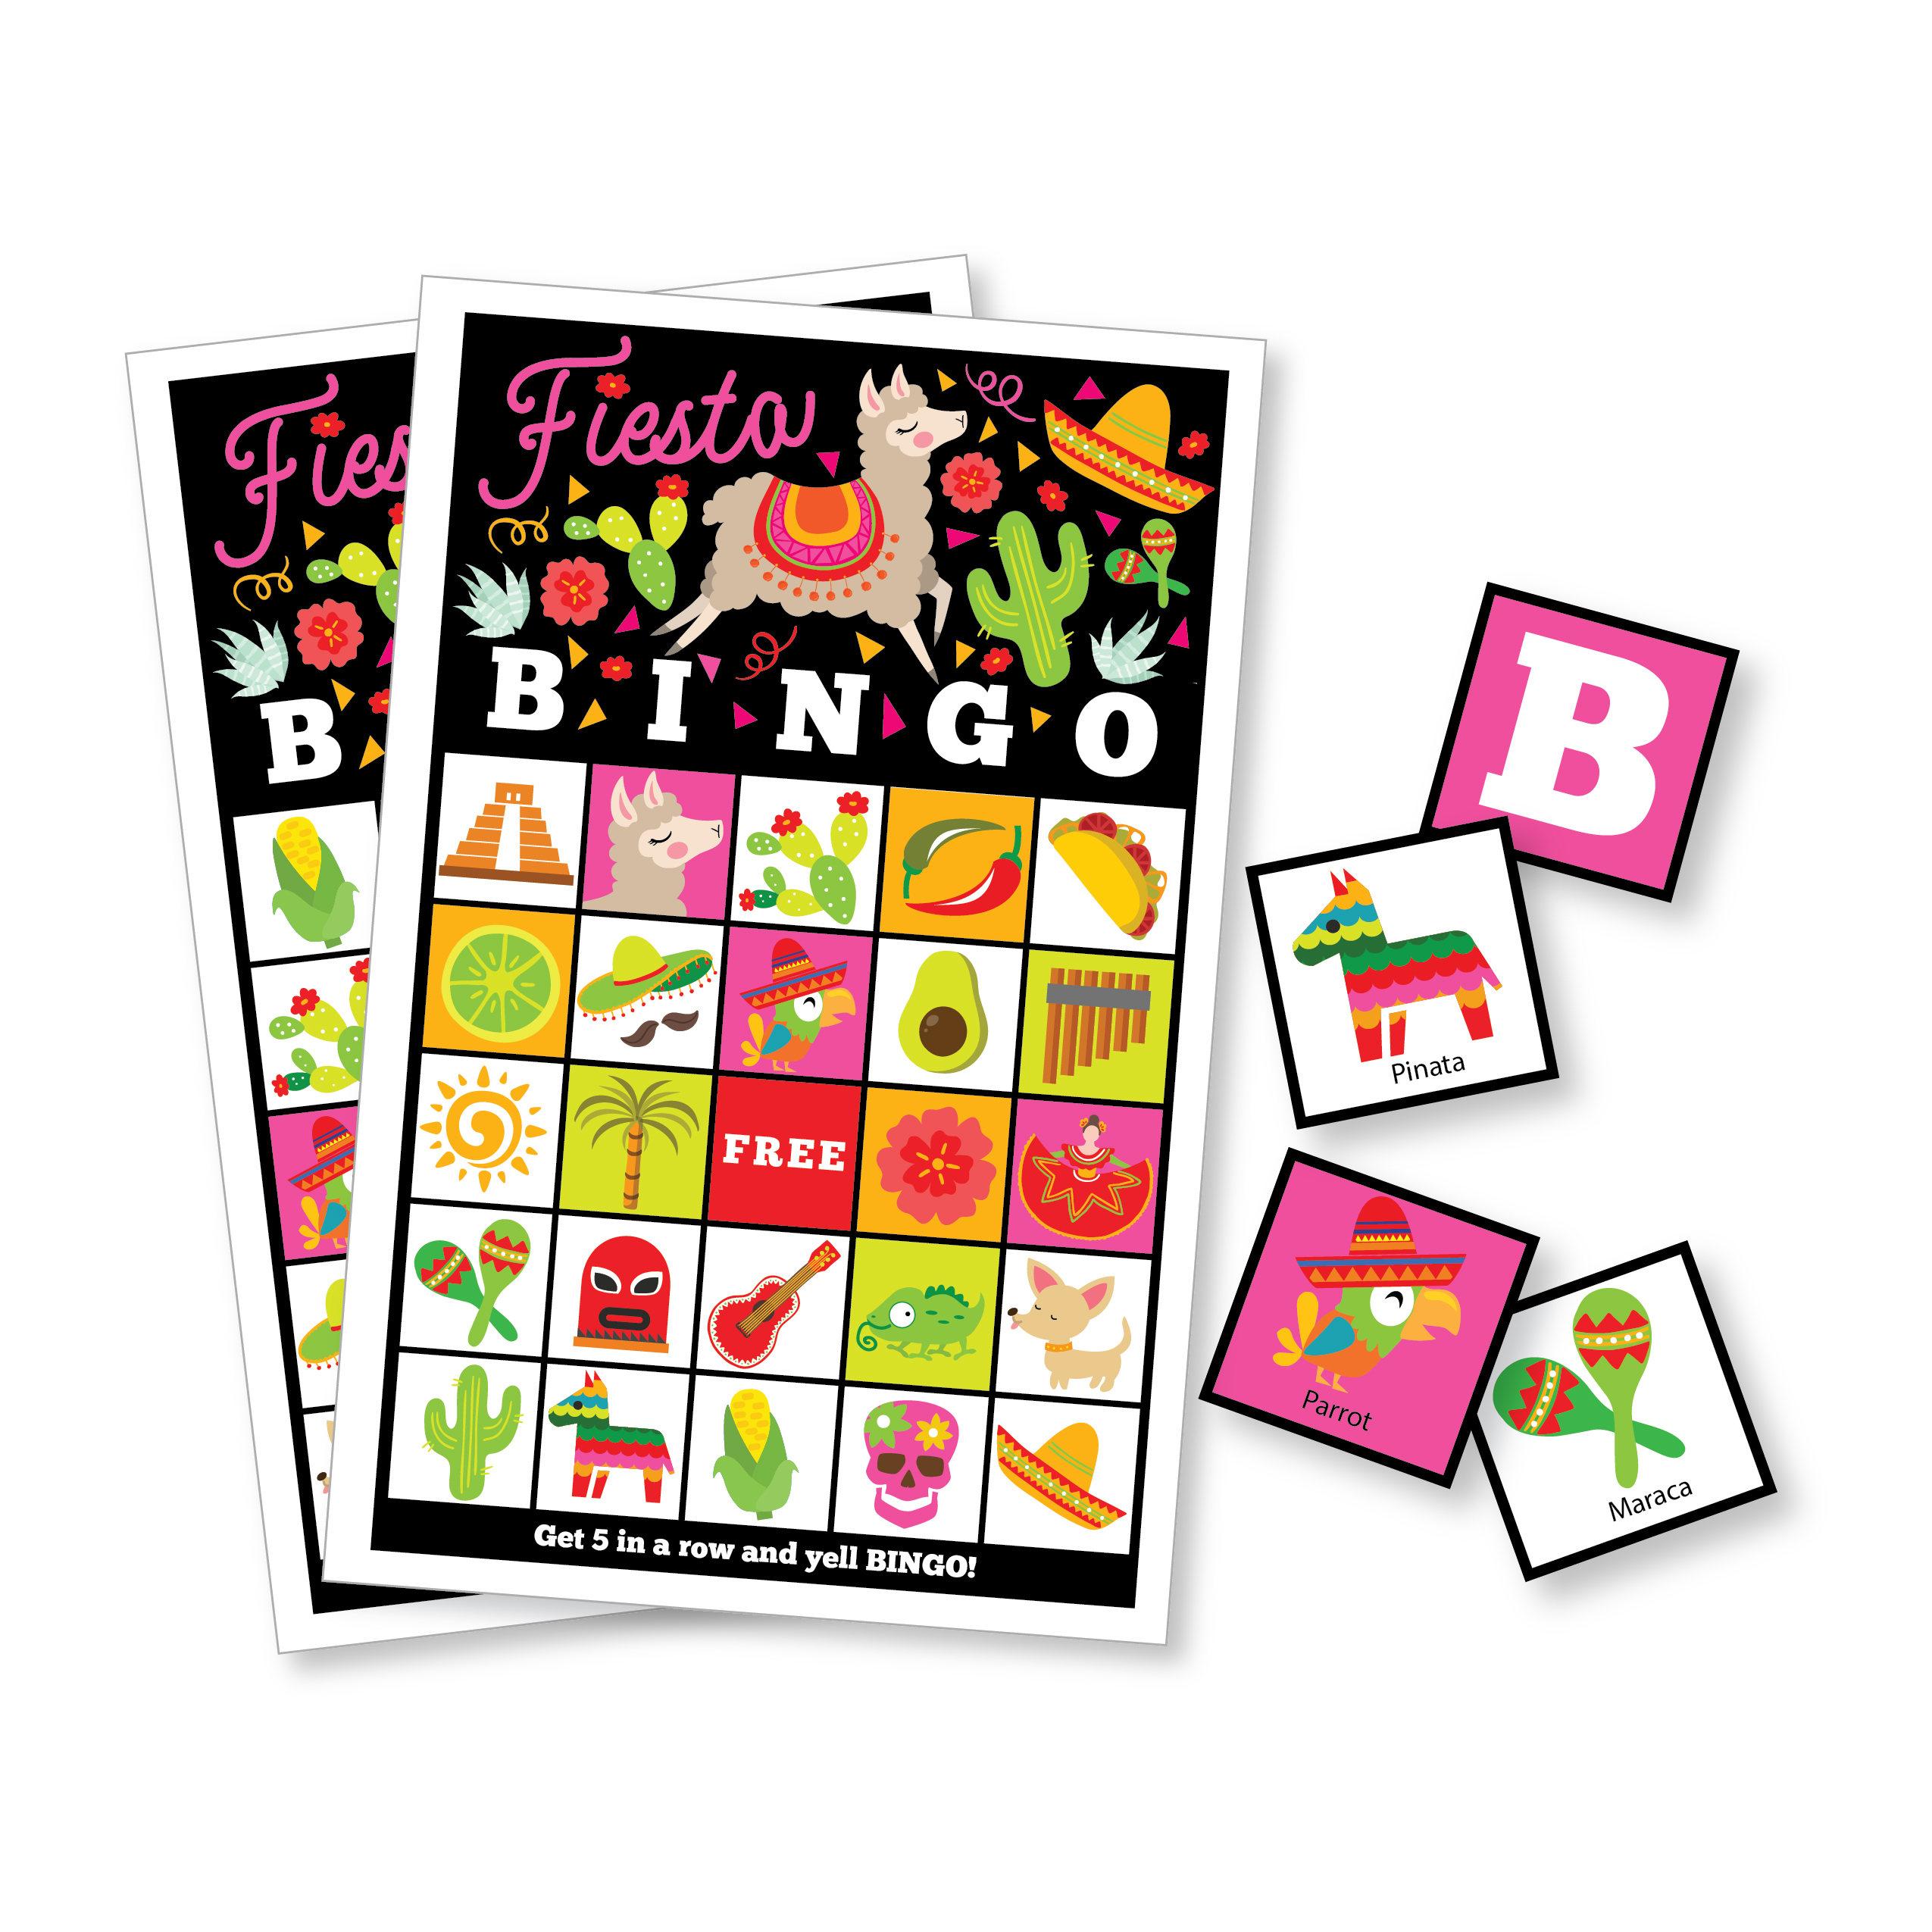 Fiesta Bingo Game - Kid's Printable Bingo Game - Bingo